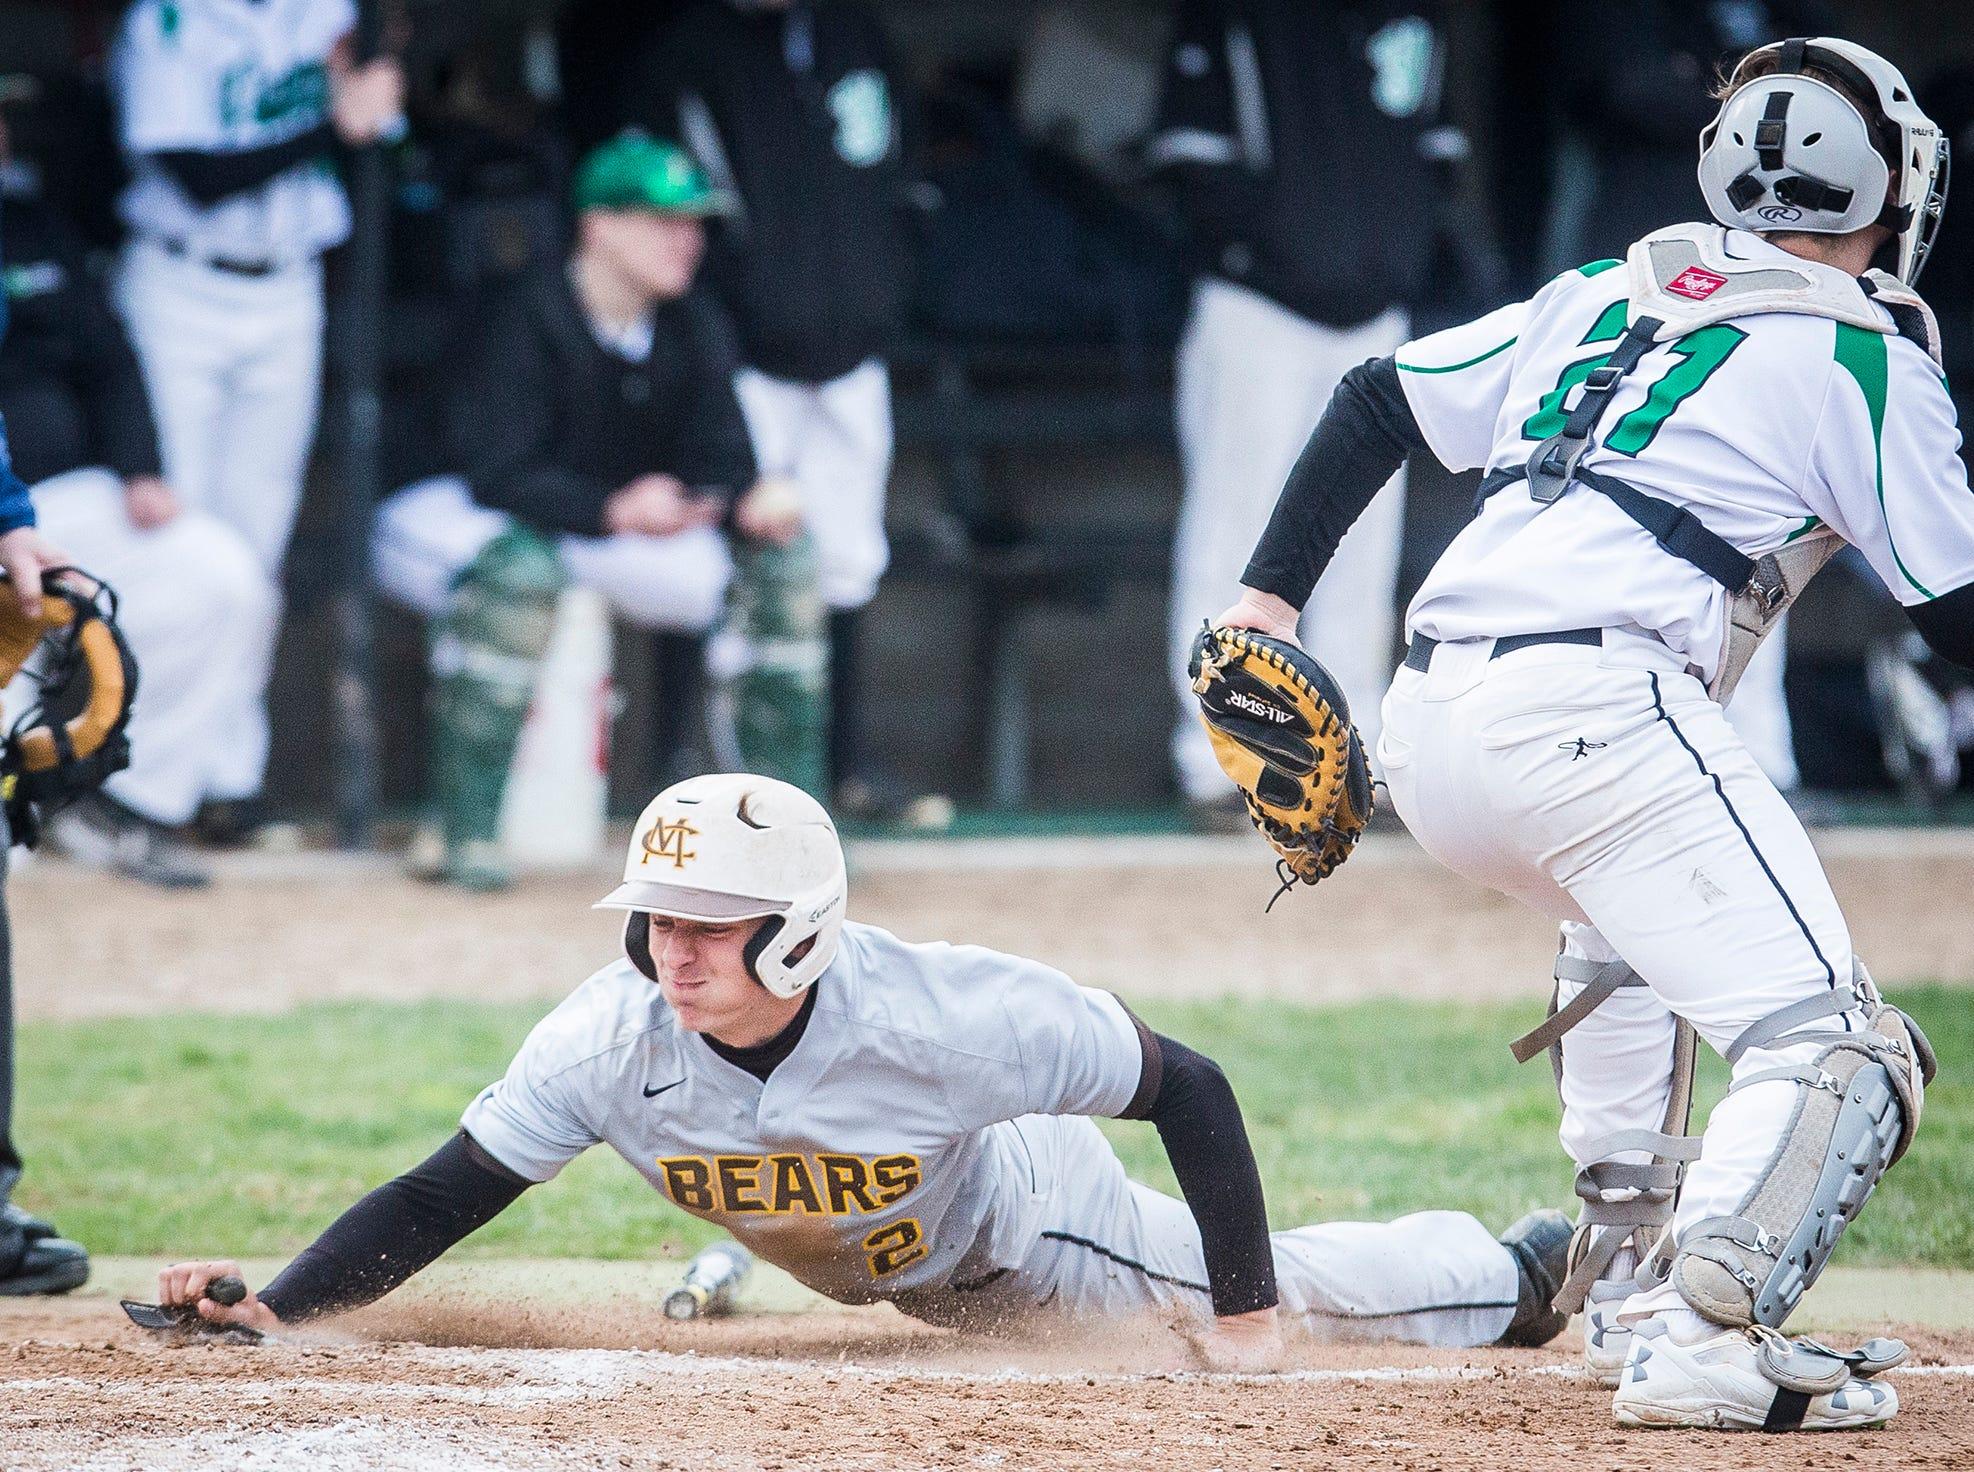 Monroe Central's Seth Wilson slides home against Yorktown during their game at Yorktown High School Wednesday, April 10, 2019.